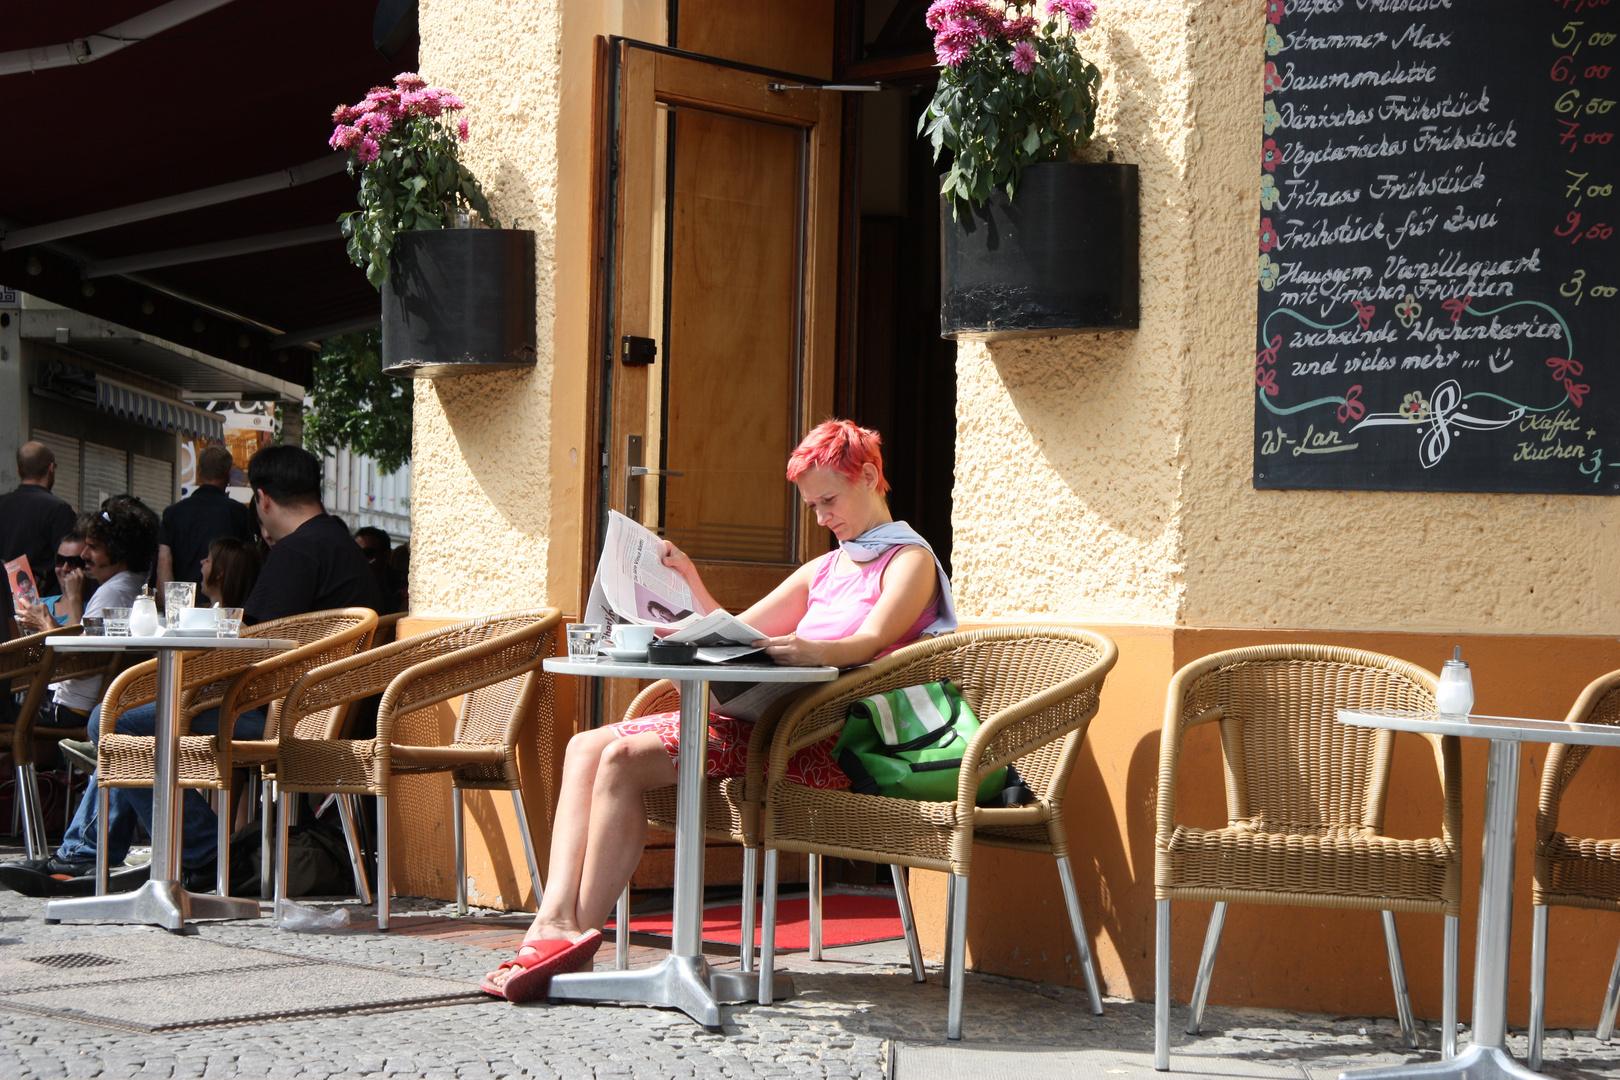 Ton in Ton im Straßencafé